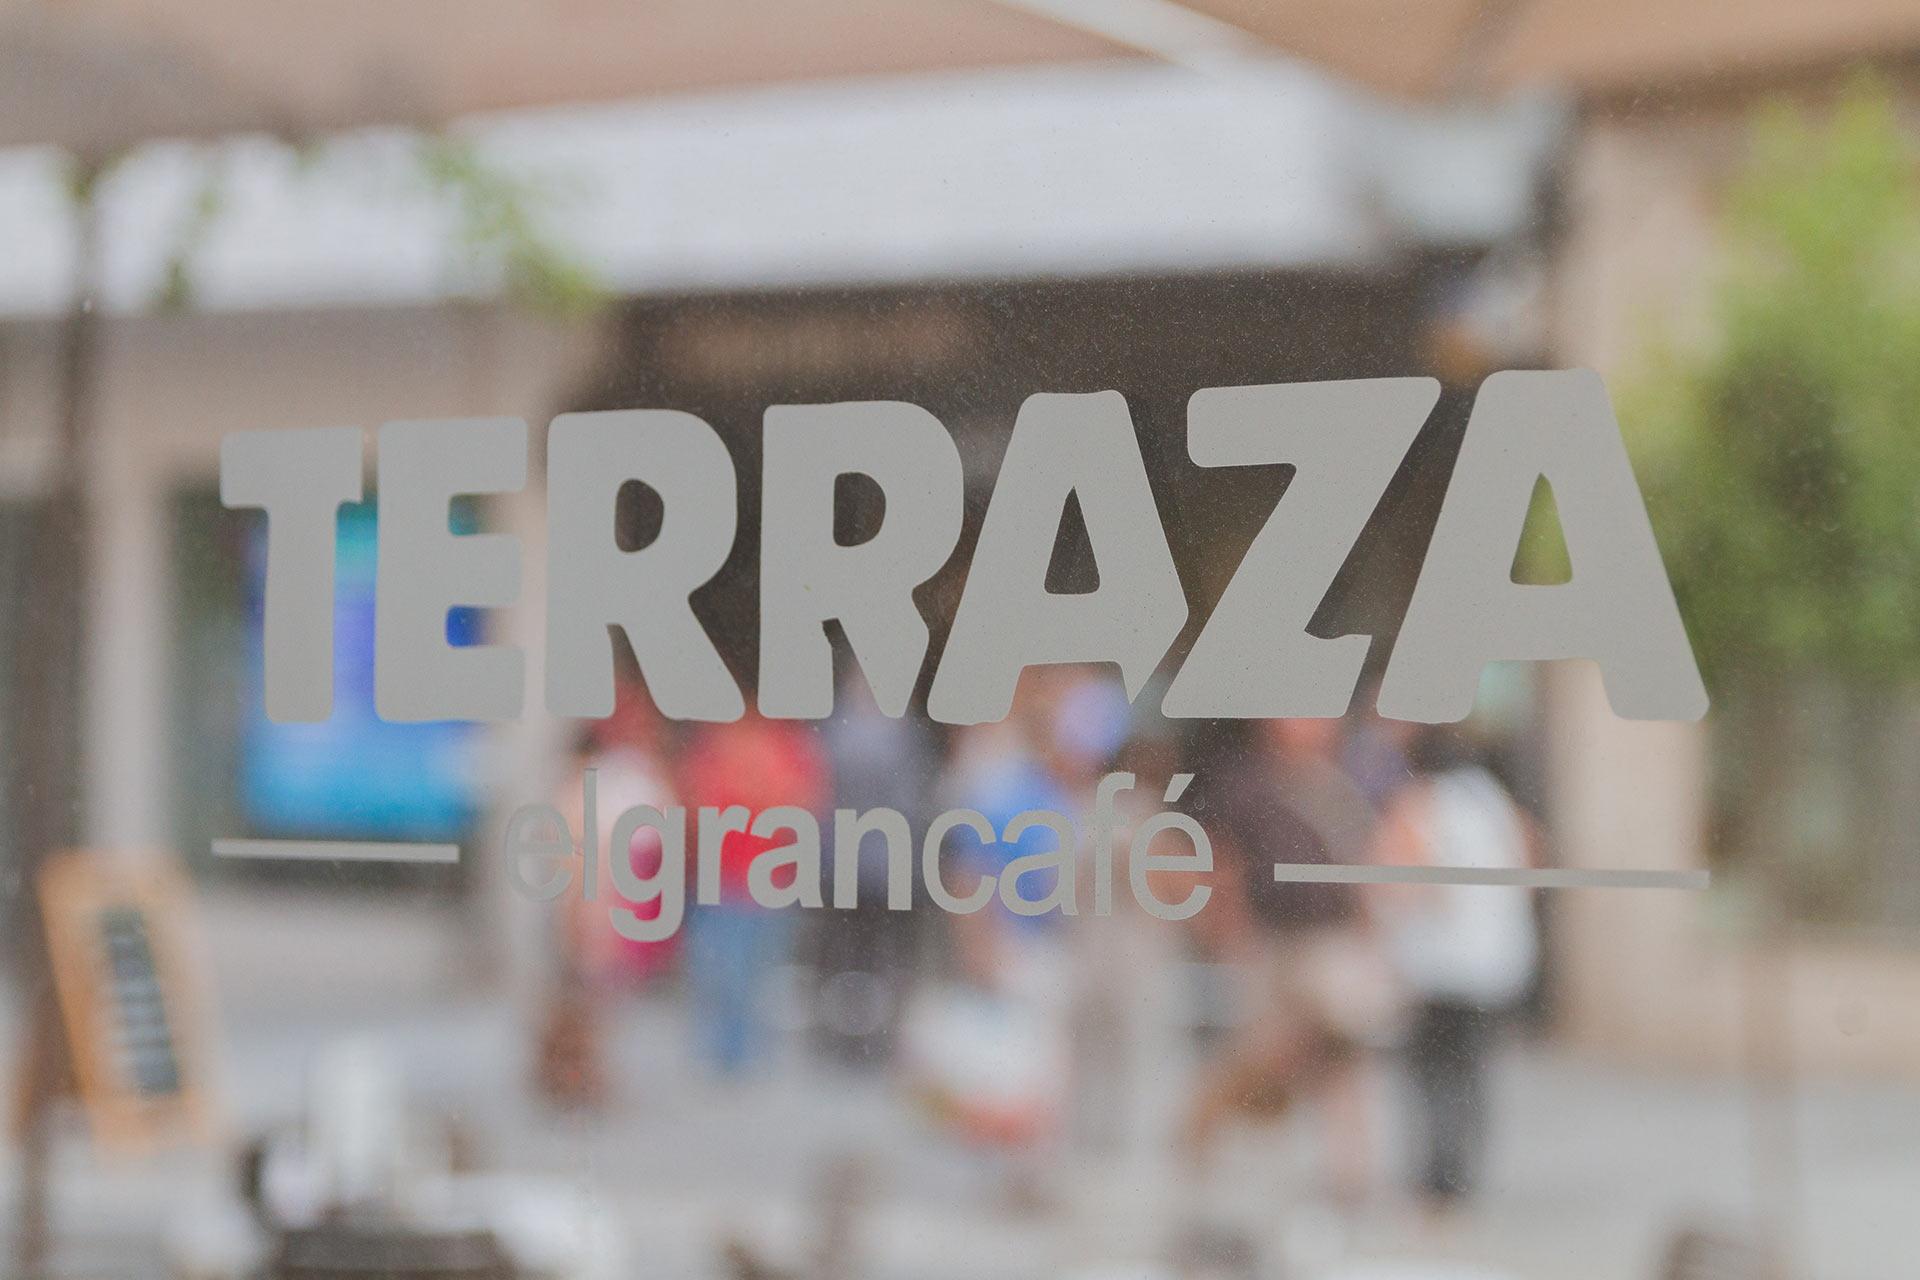 Terraza El Gran Café